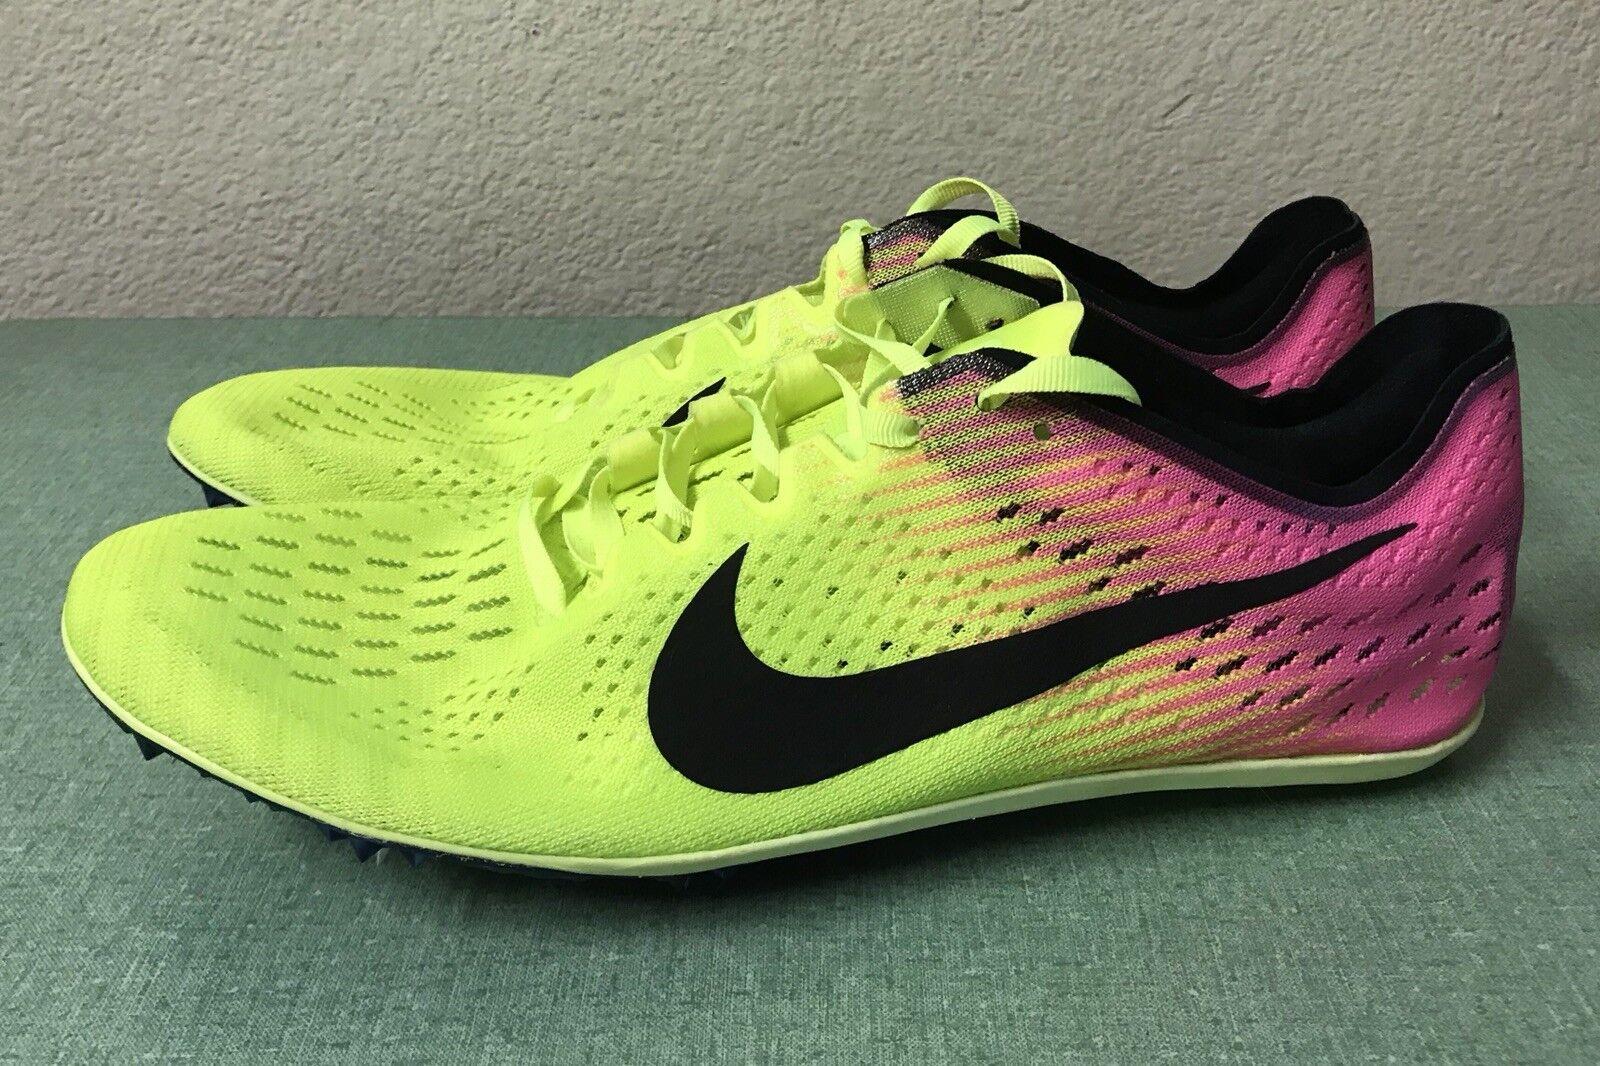 Nike Zoom Victory Elite 2 Sz Volt Noir rose Hommes Sz 2 11 Track & Field Spikes NEW 78d3c2